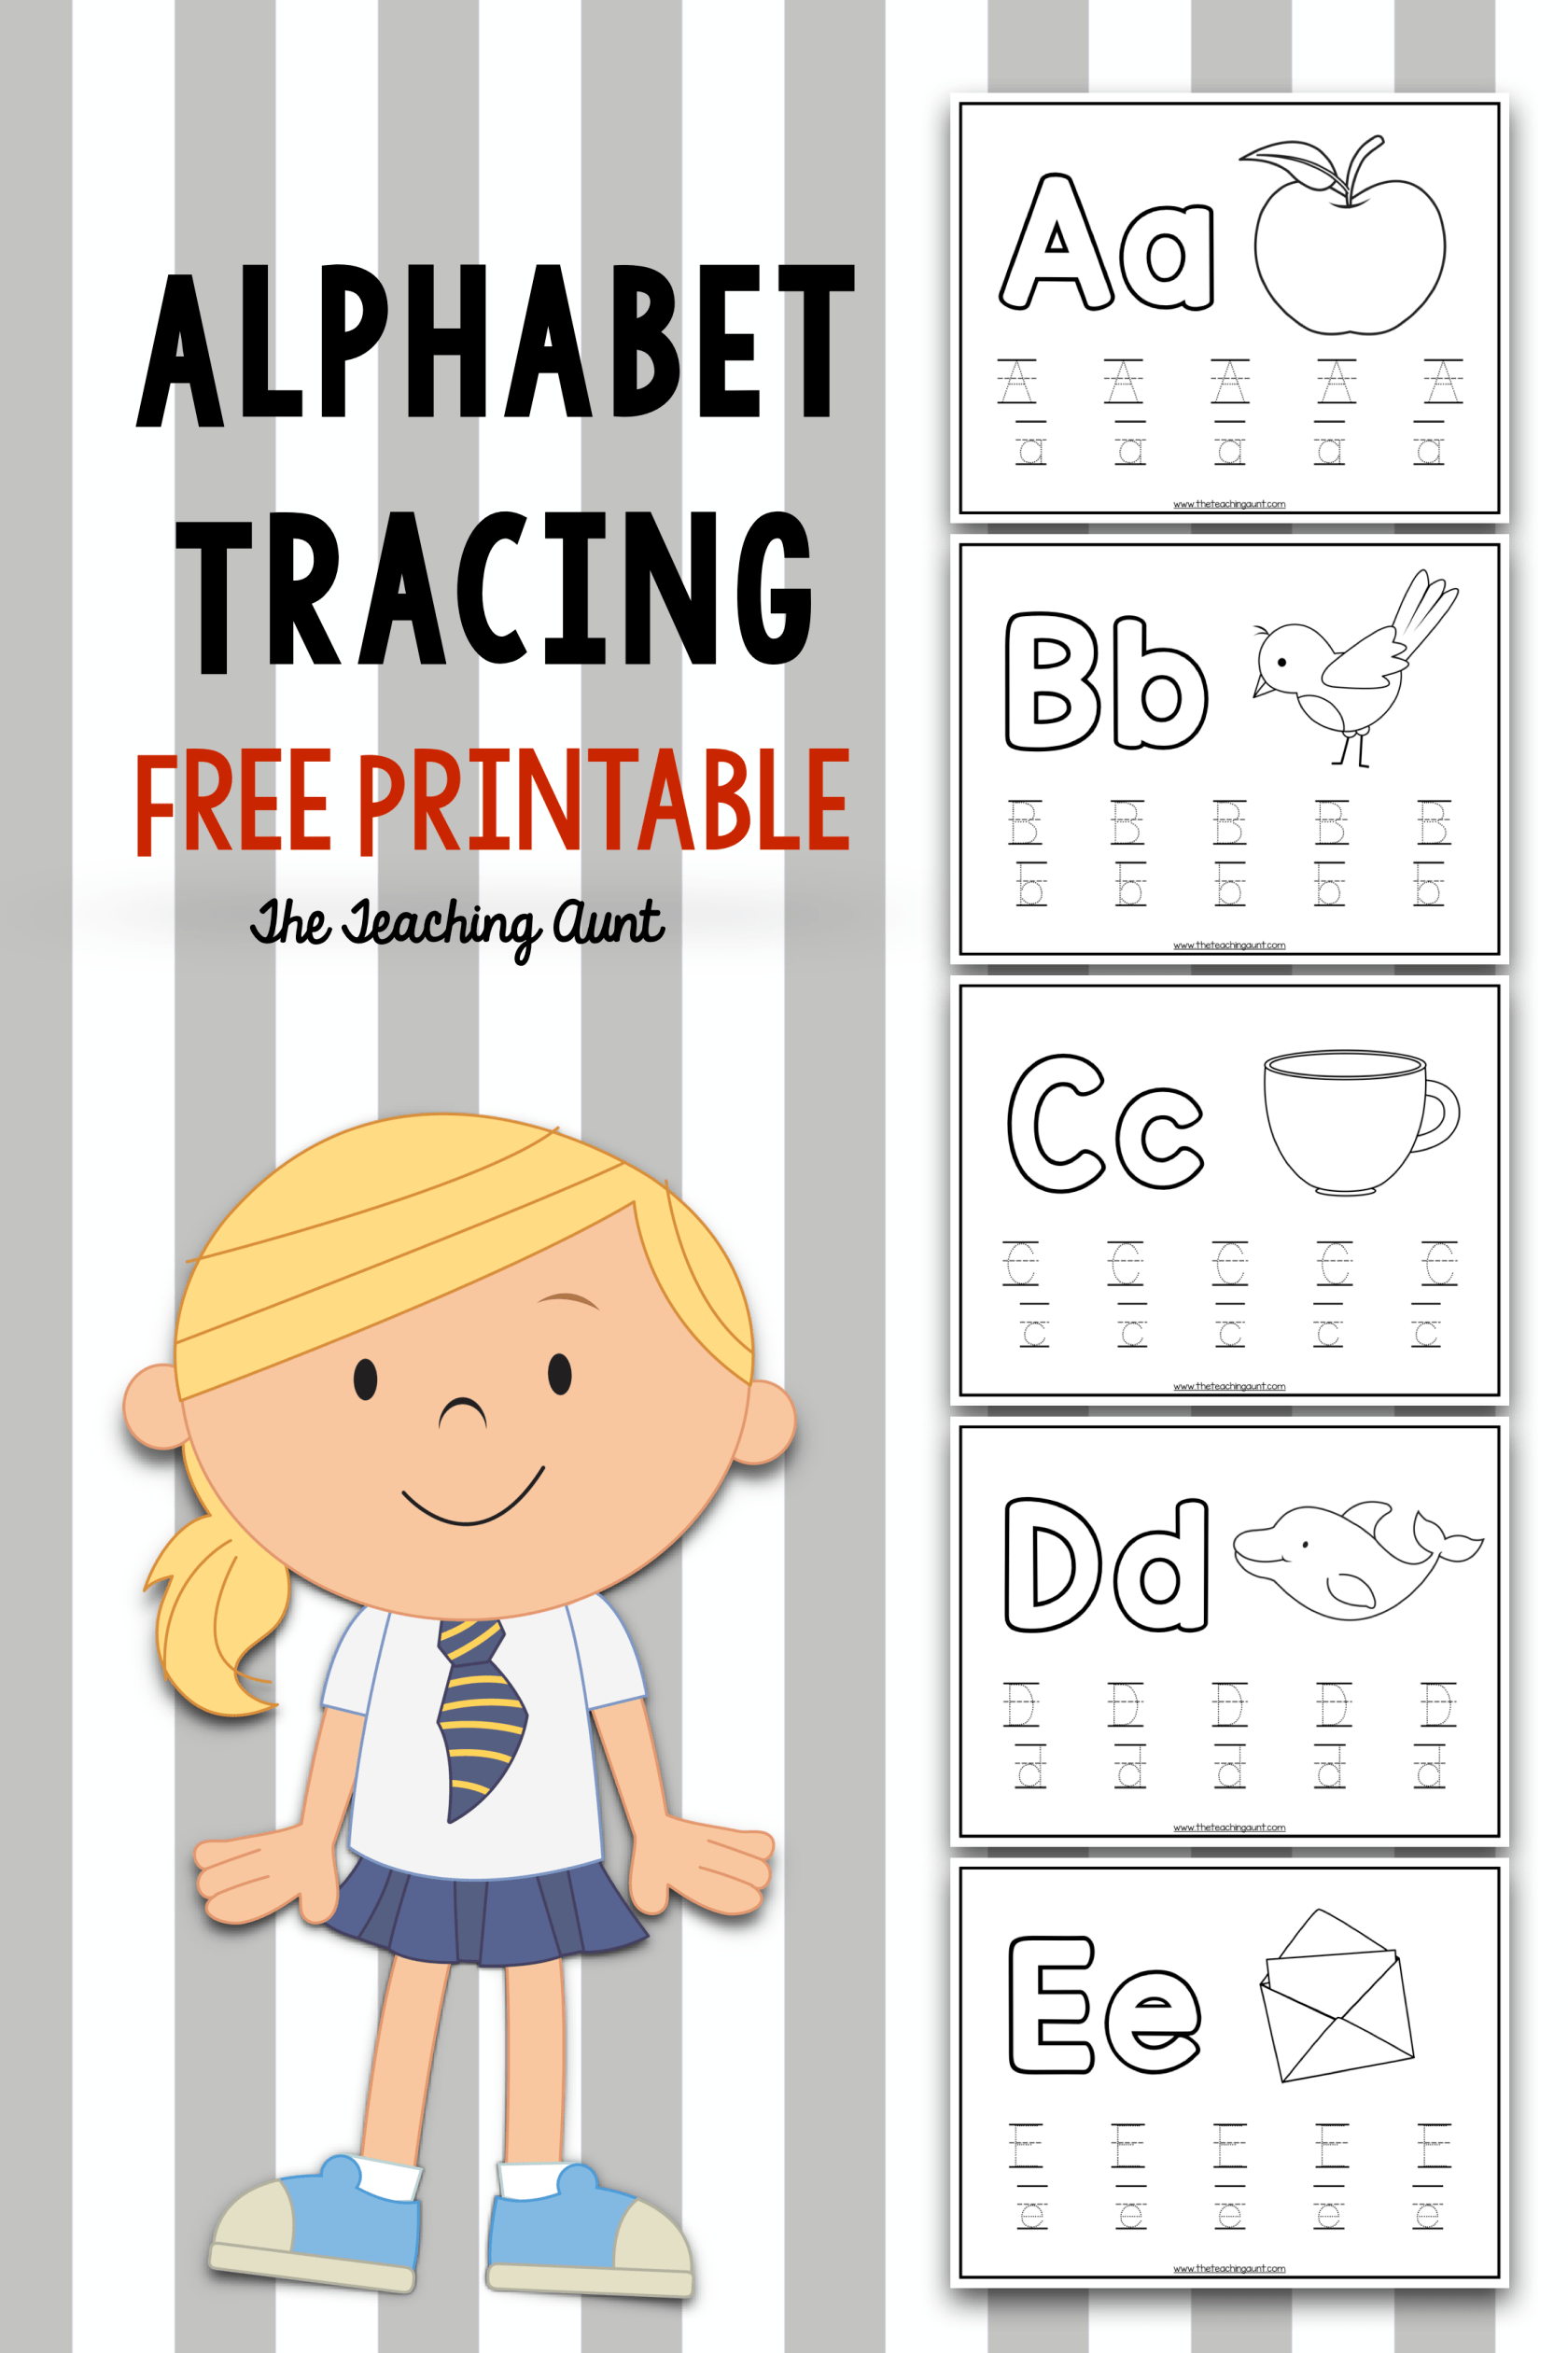 Alphabet Tracing Free Printable